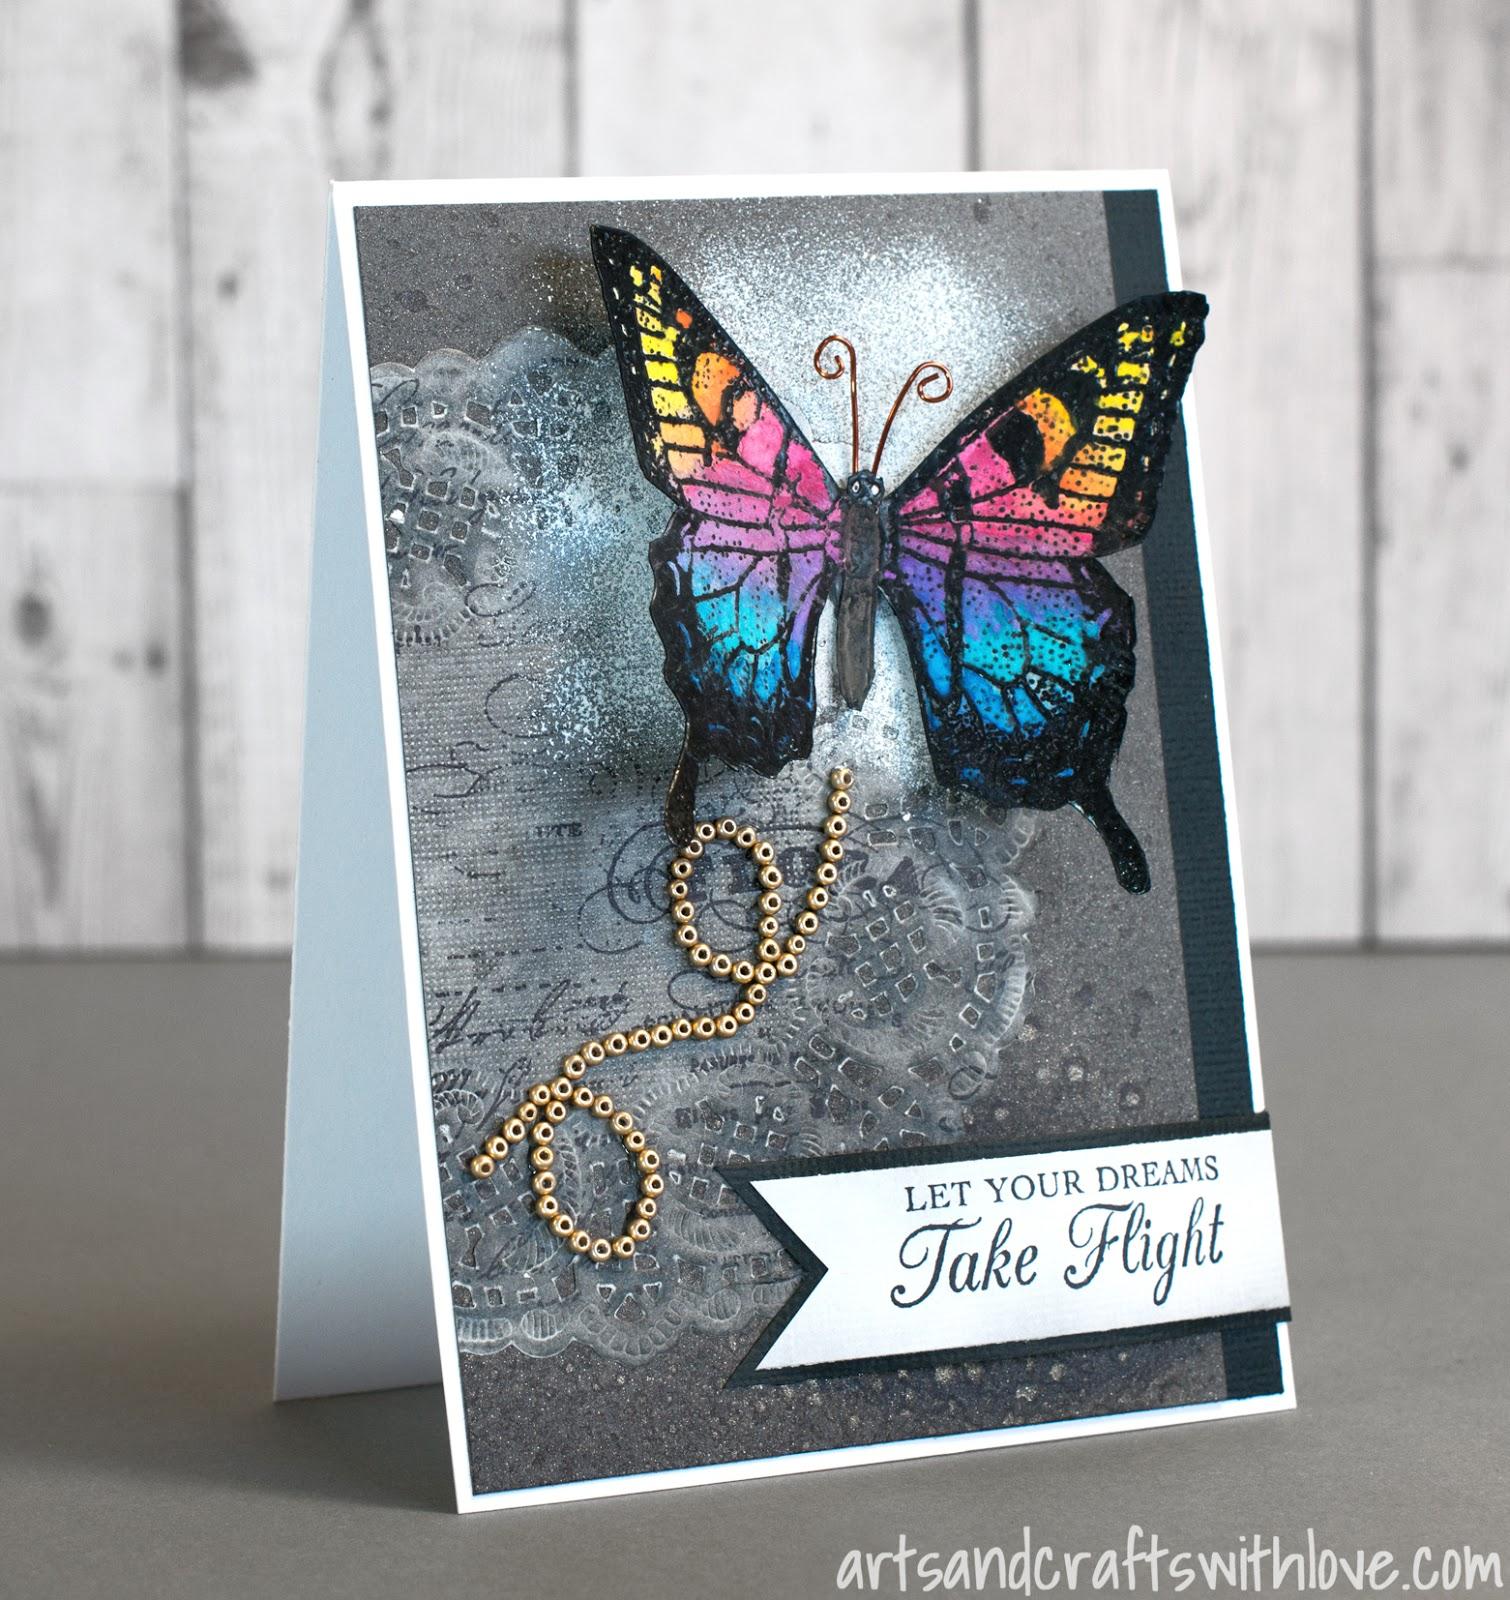 Cardmaking: Let Your Dreams Take Flight